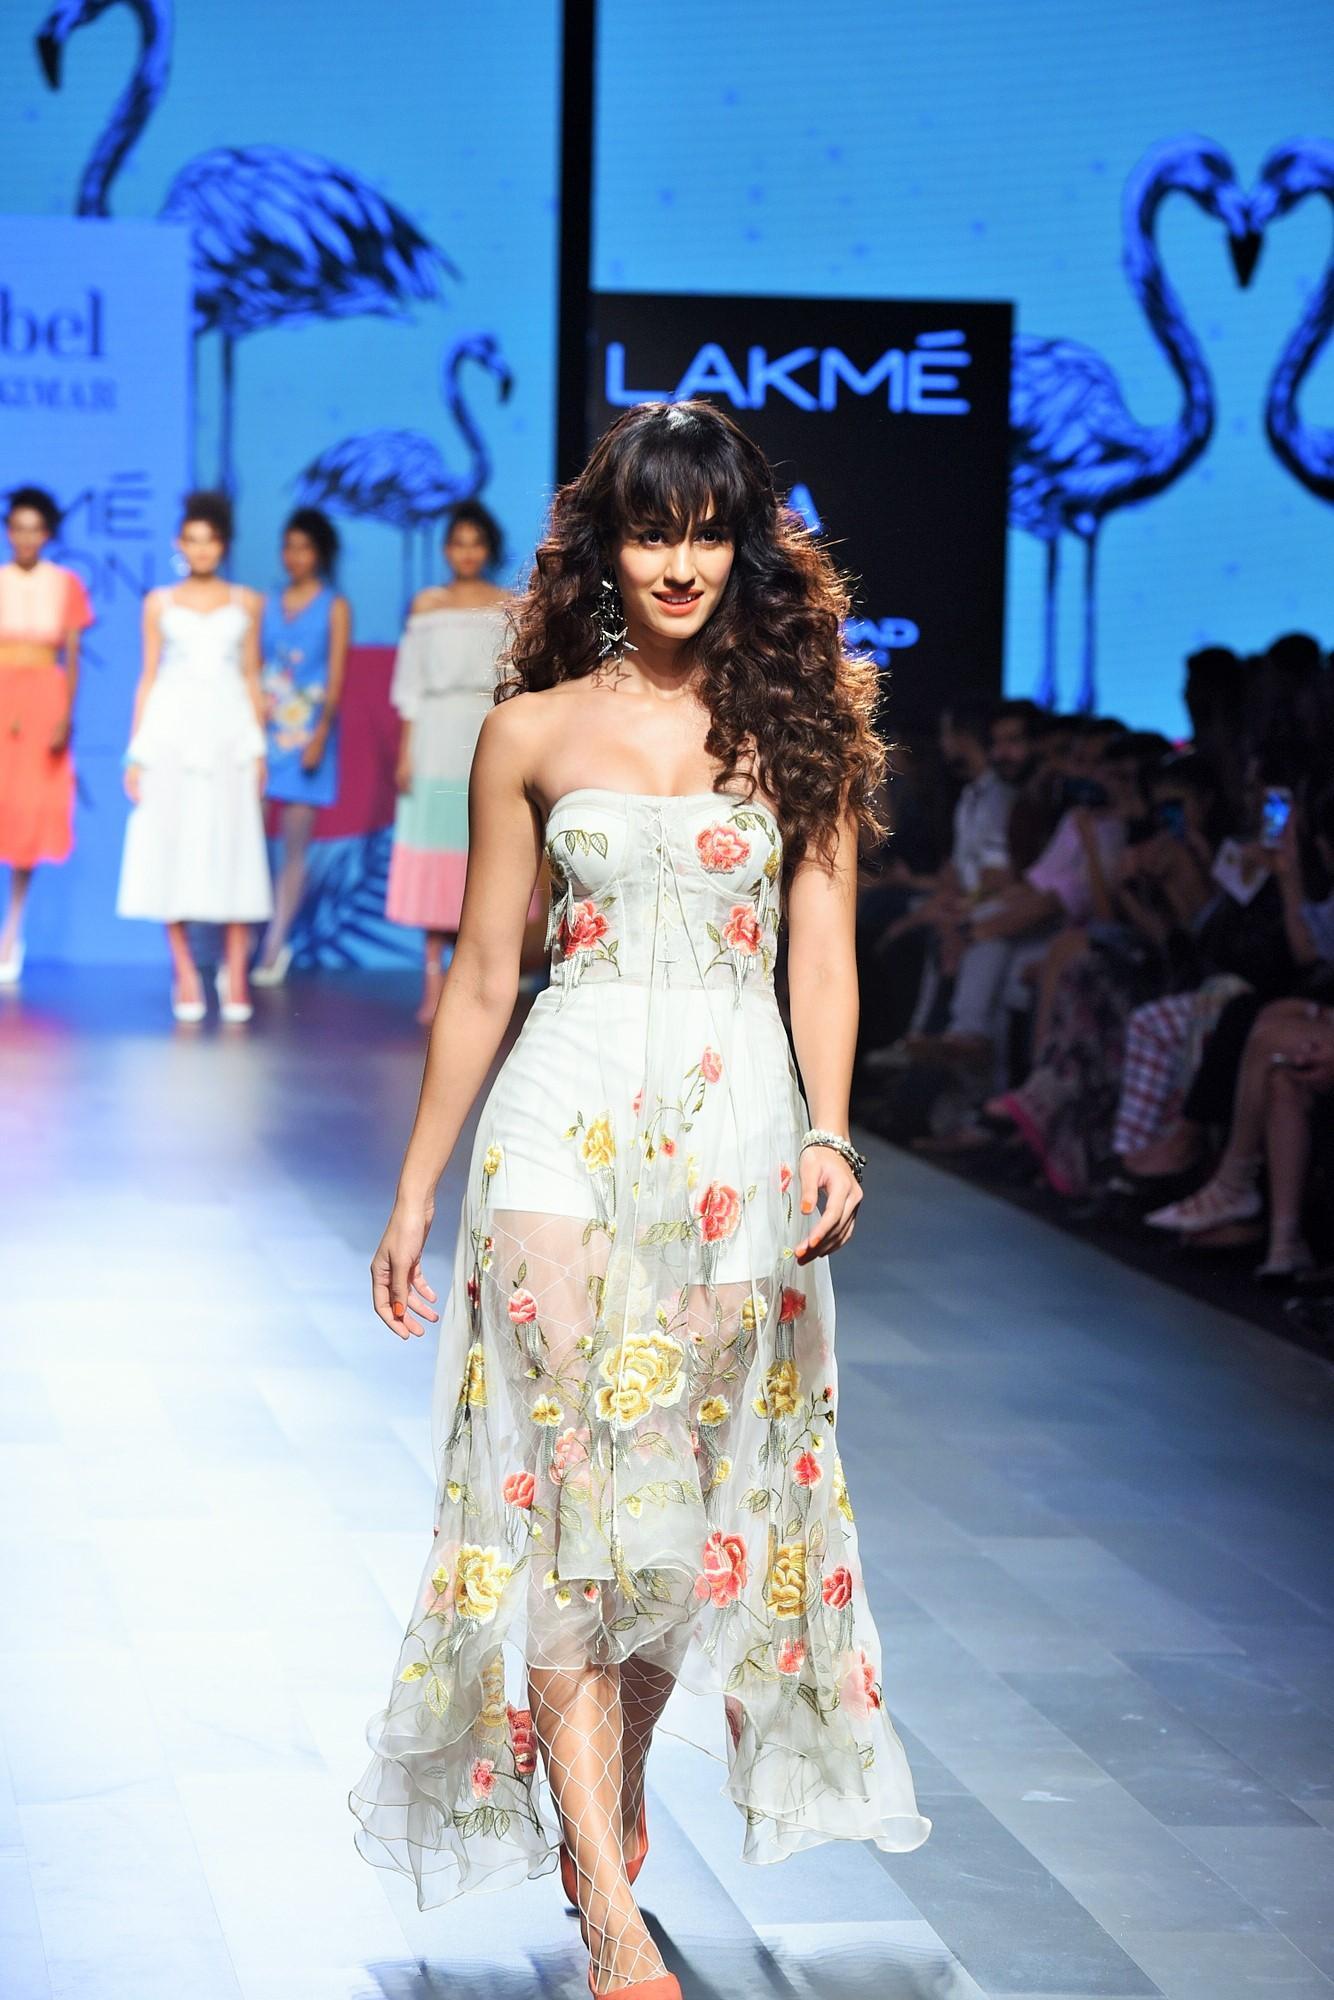 Masaba Gupta's Quirky Take on Birdal Wear